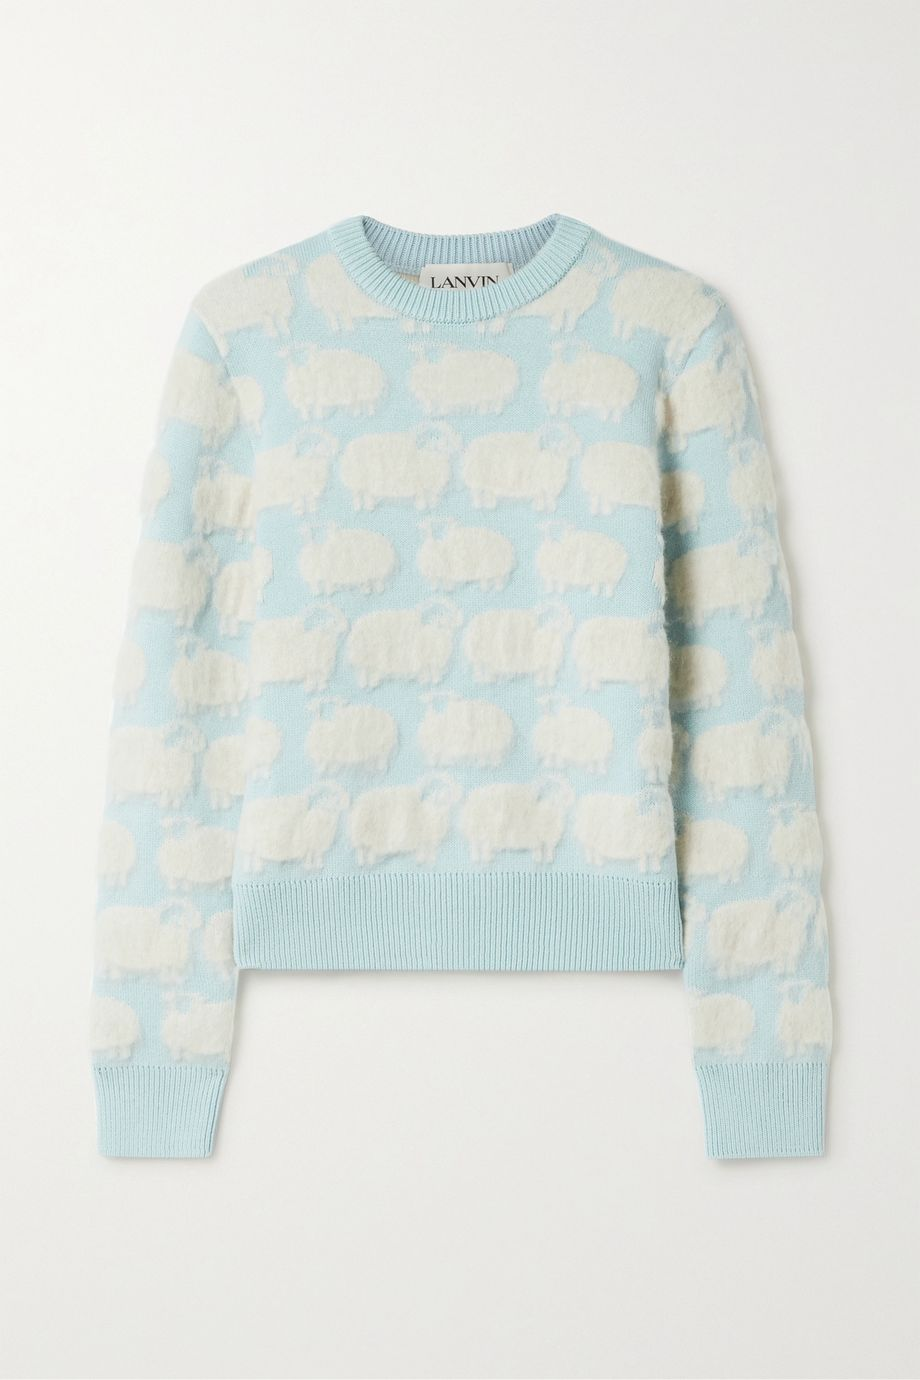 Lanvin Jacquard-knit sweater